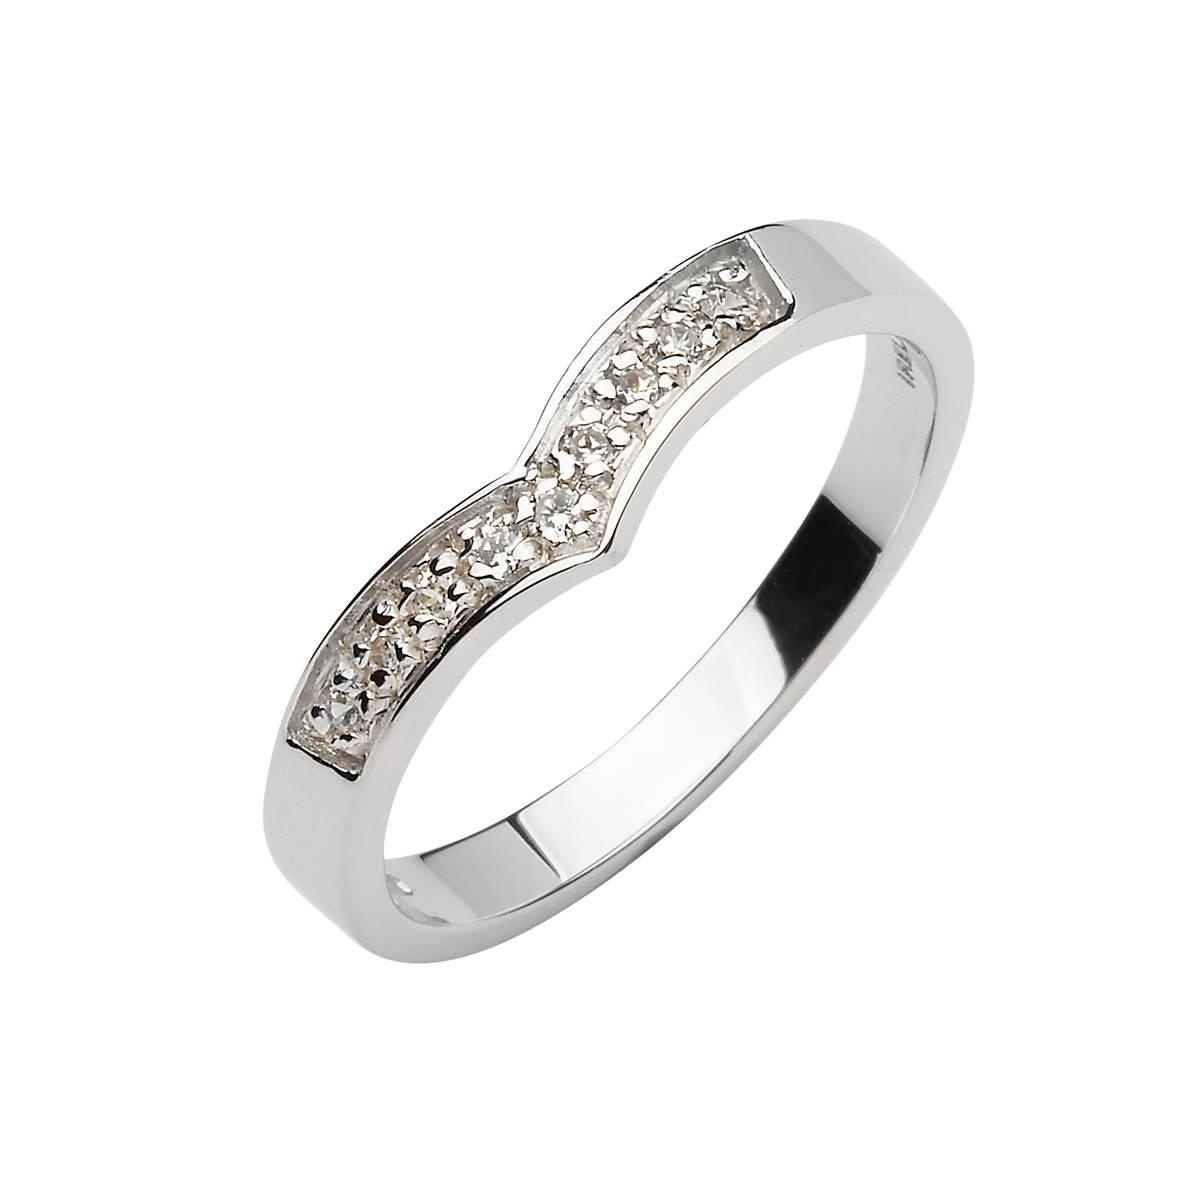 10 carat white gold Diamond Set Wishbone Band